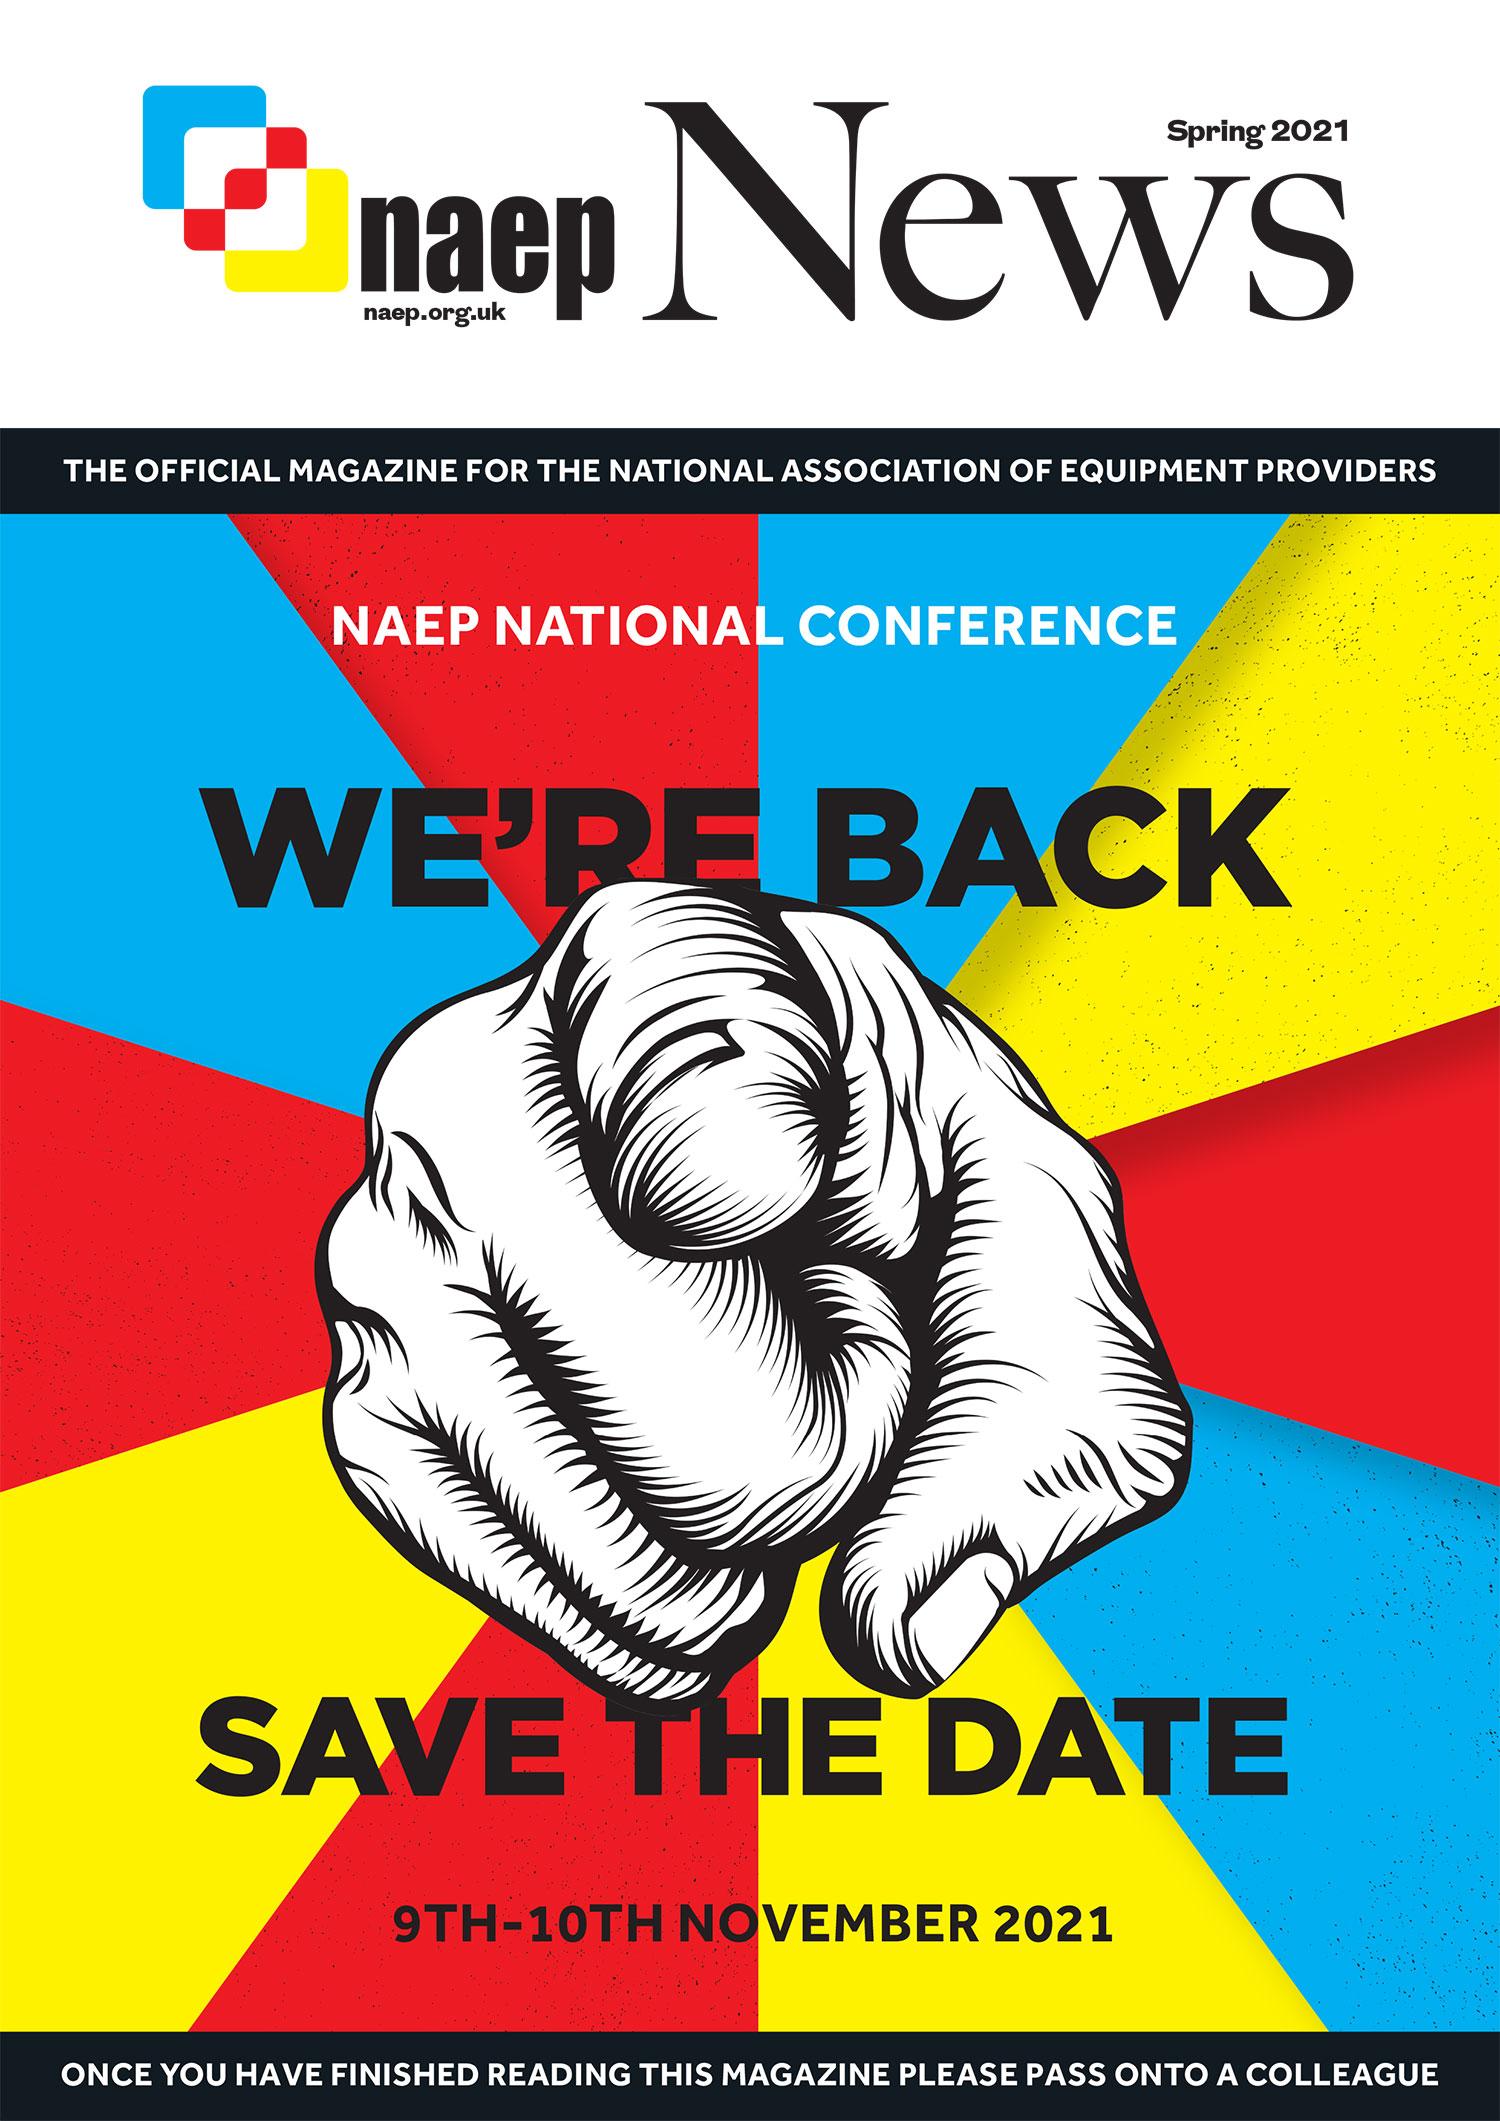 NAEP News Spring 2021